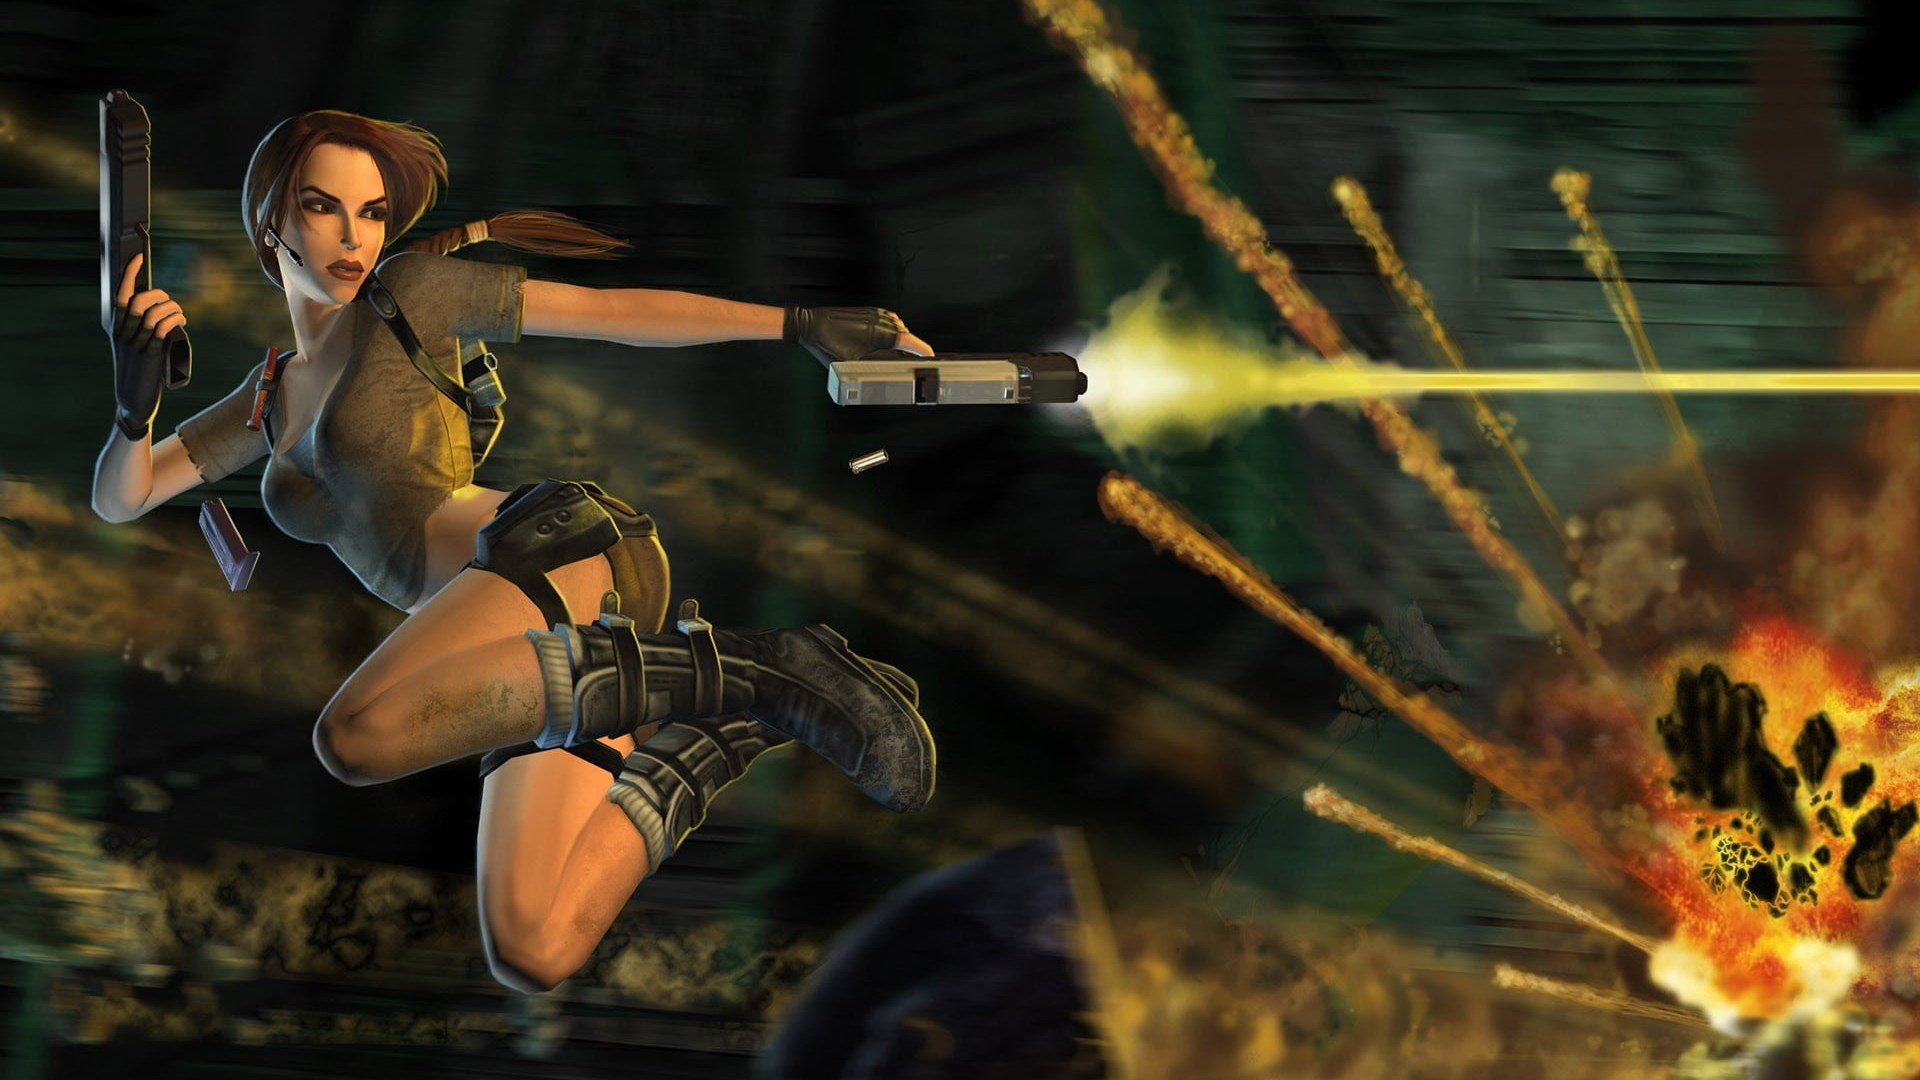 Buy Tomb Raider:Legend - Microsoft Store